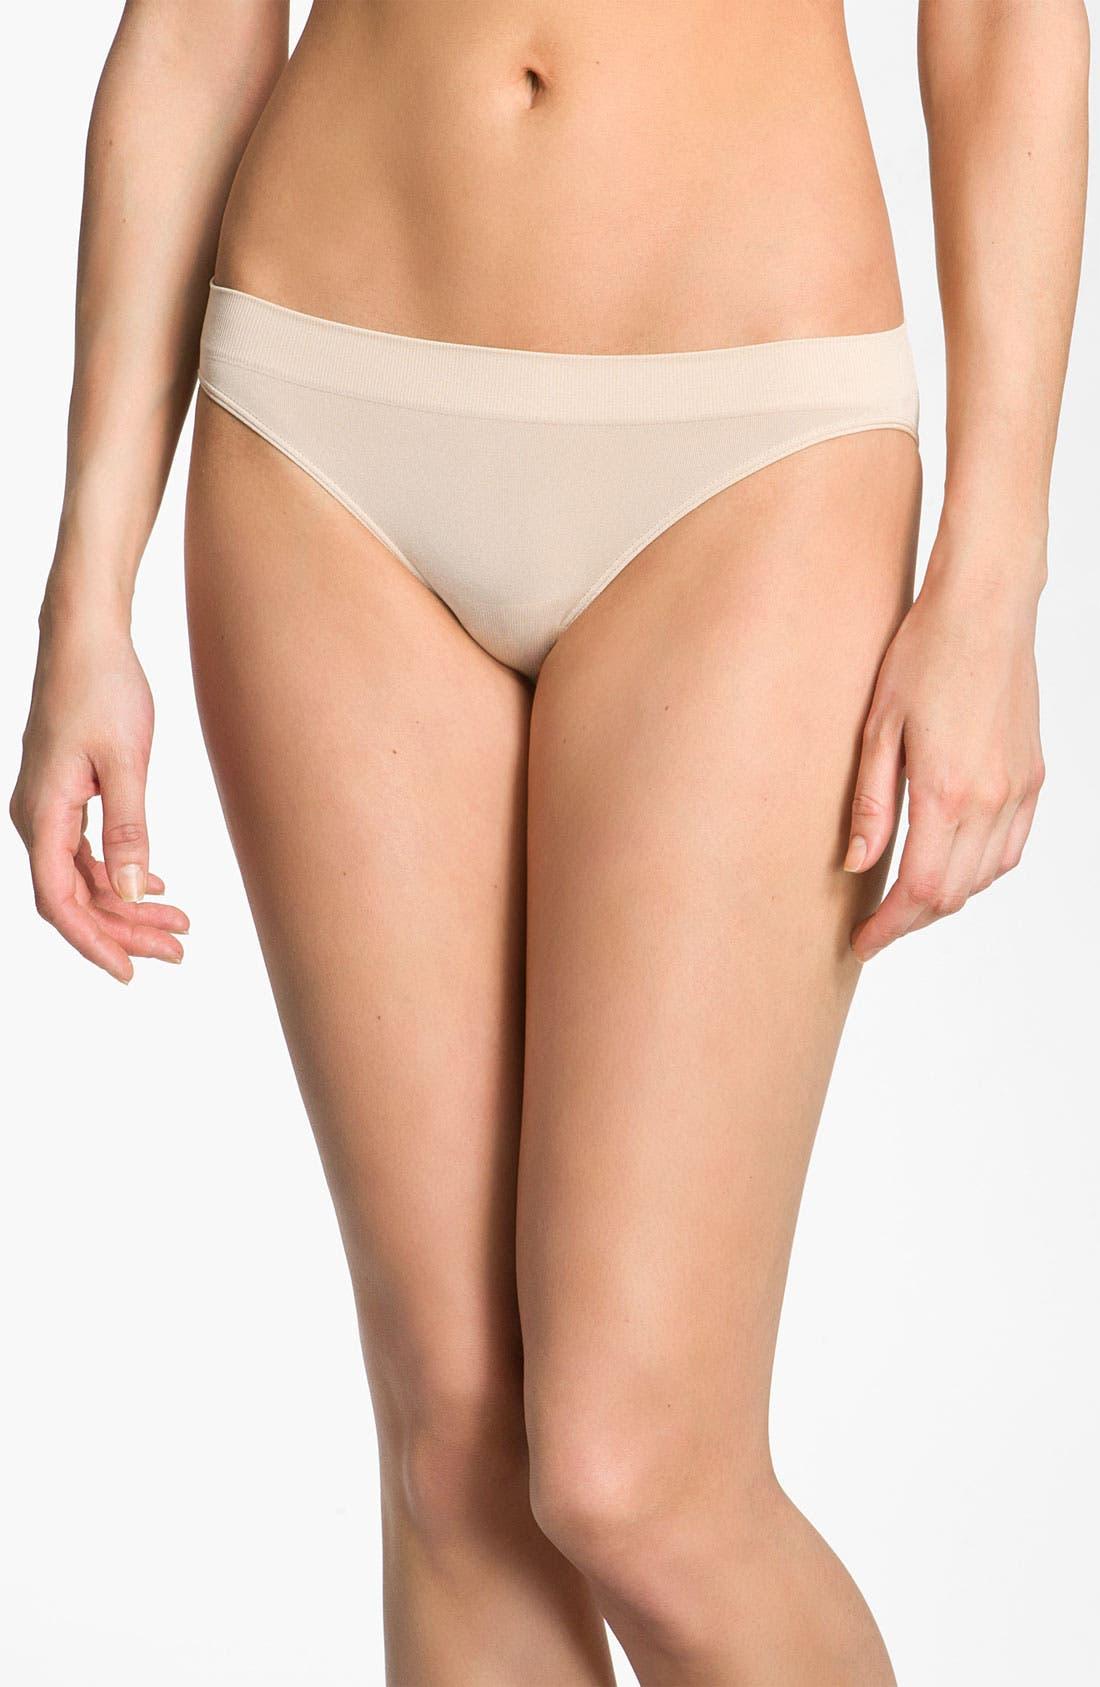 Alternate Image 1 Selected - Wacoal 'B Smooth' Bikini (3 for $39)